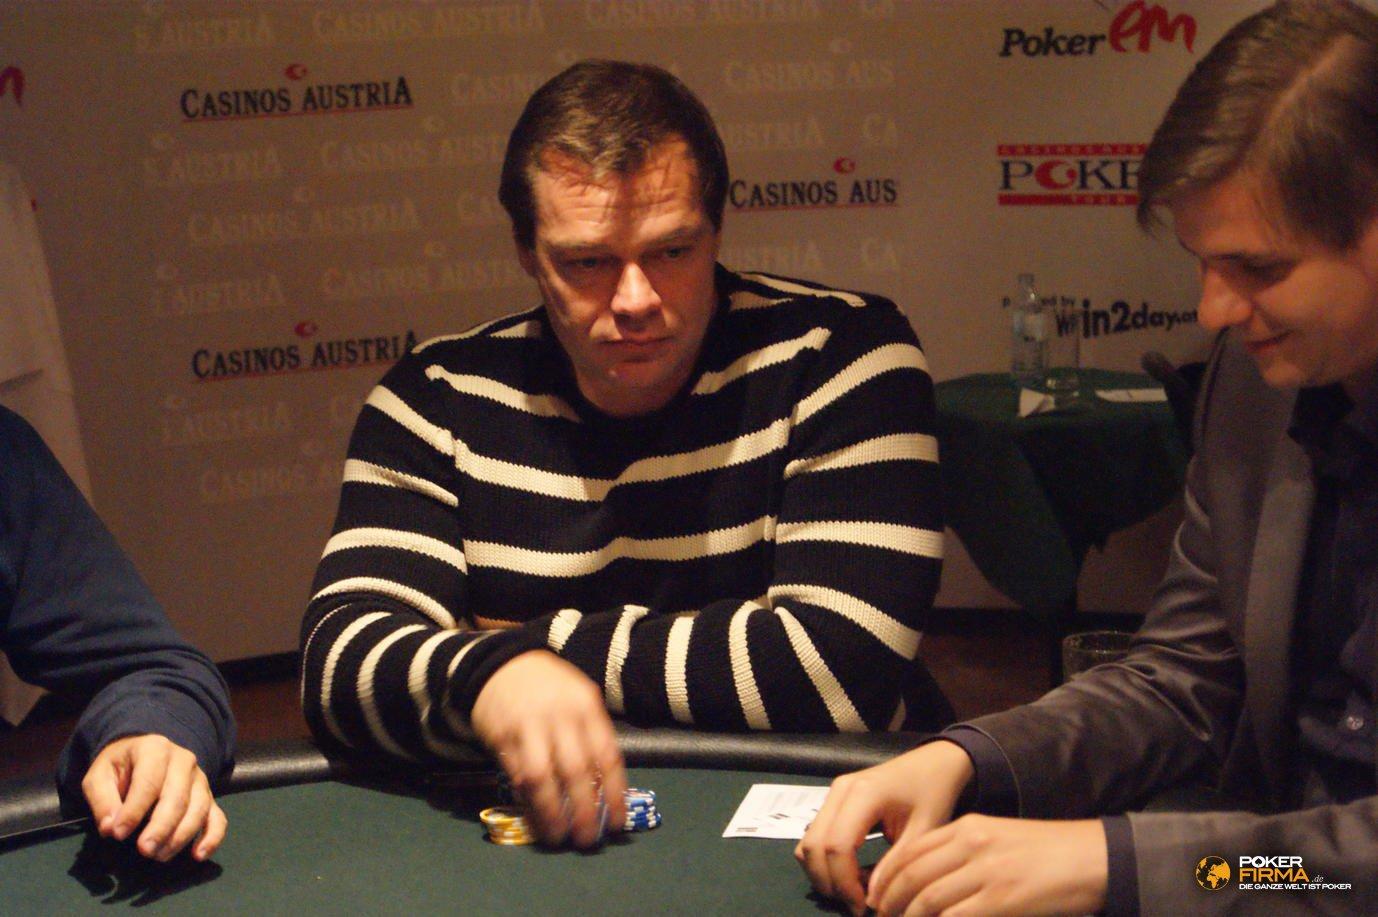 Poker_EM_2000_NLH_251011_Andreas_Krause